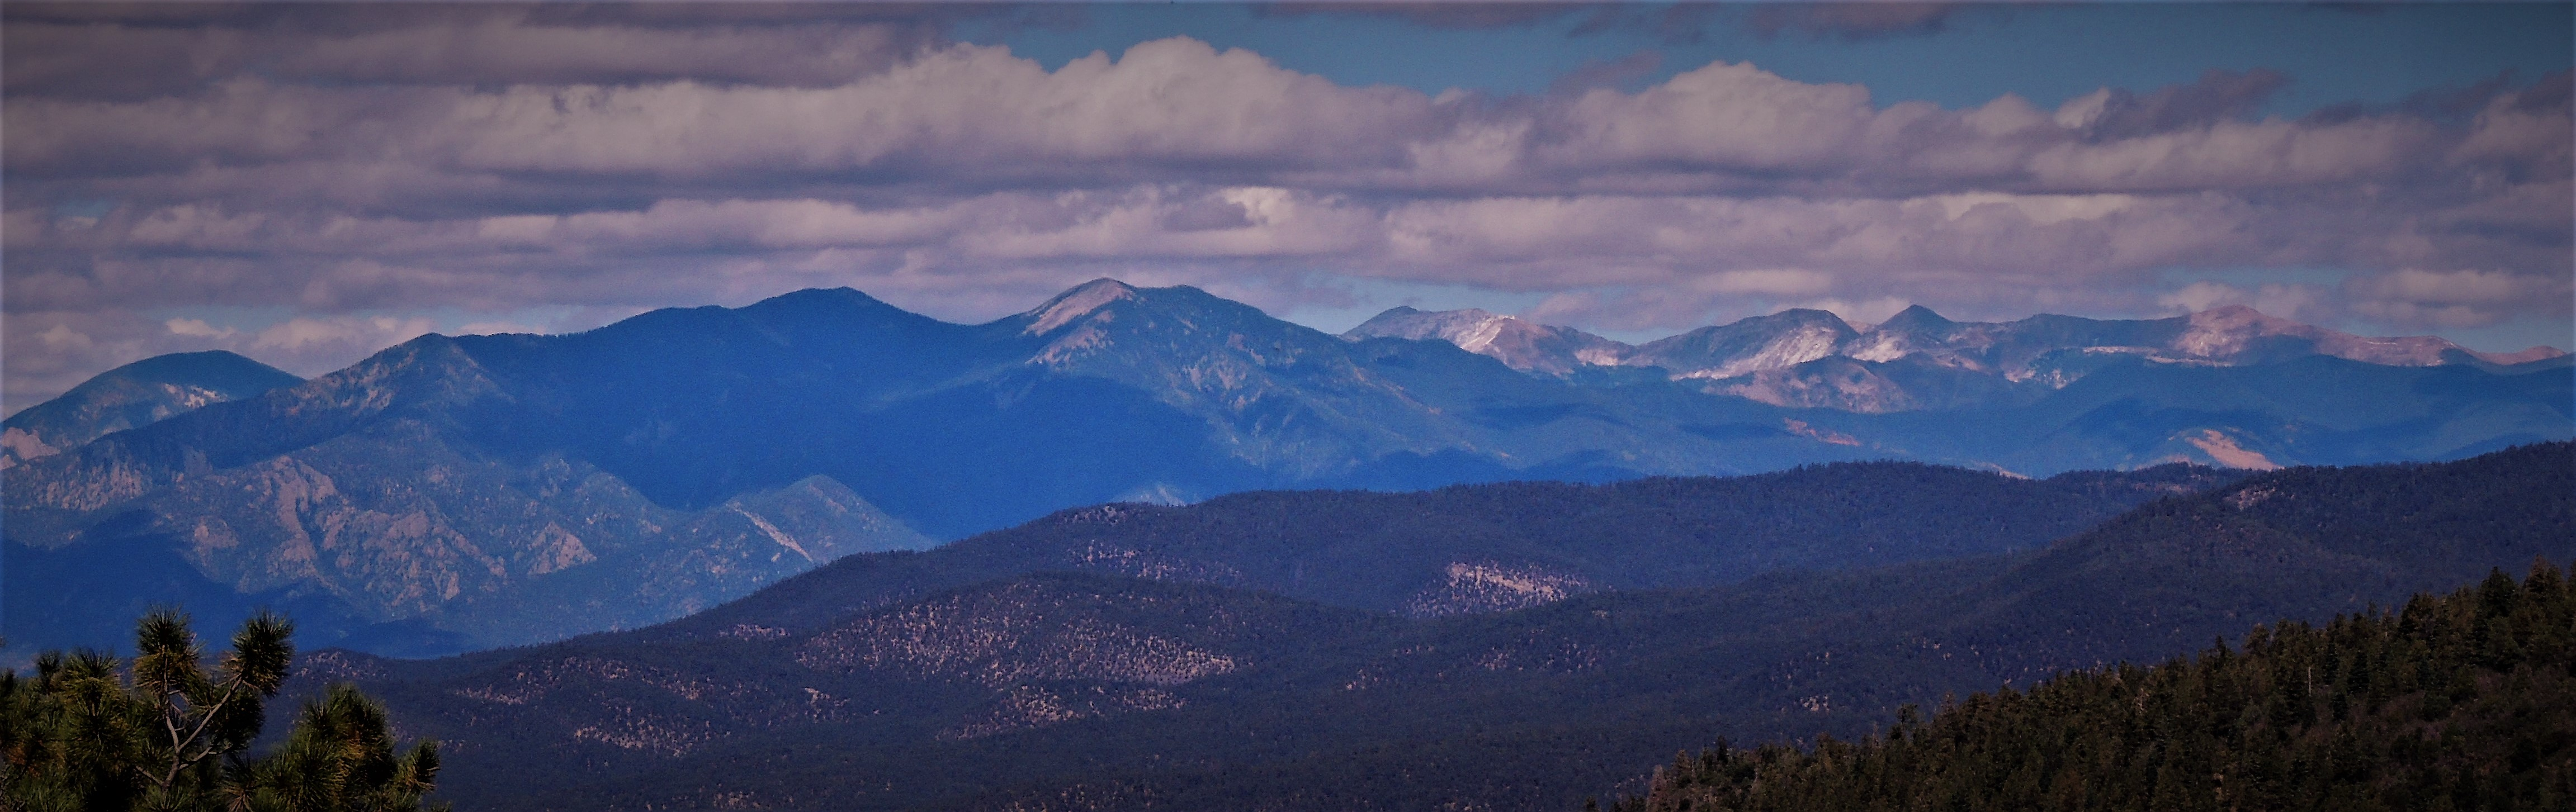 YBT - High road to Taos 2017